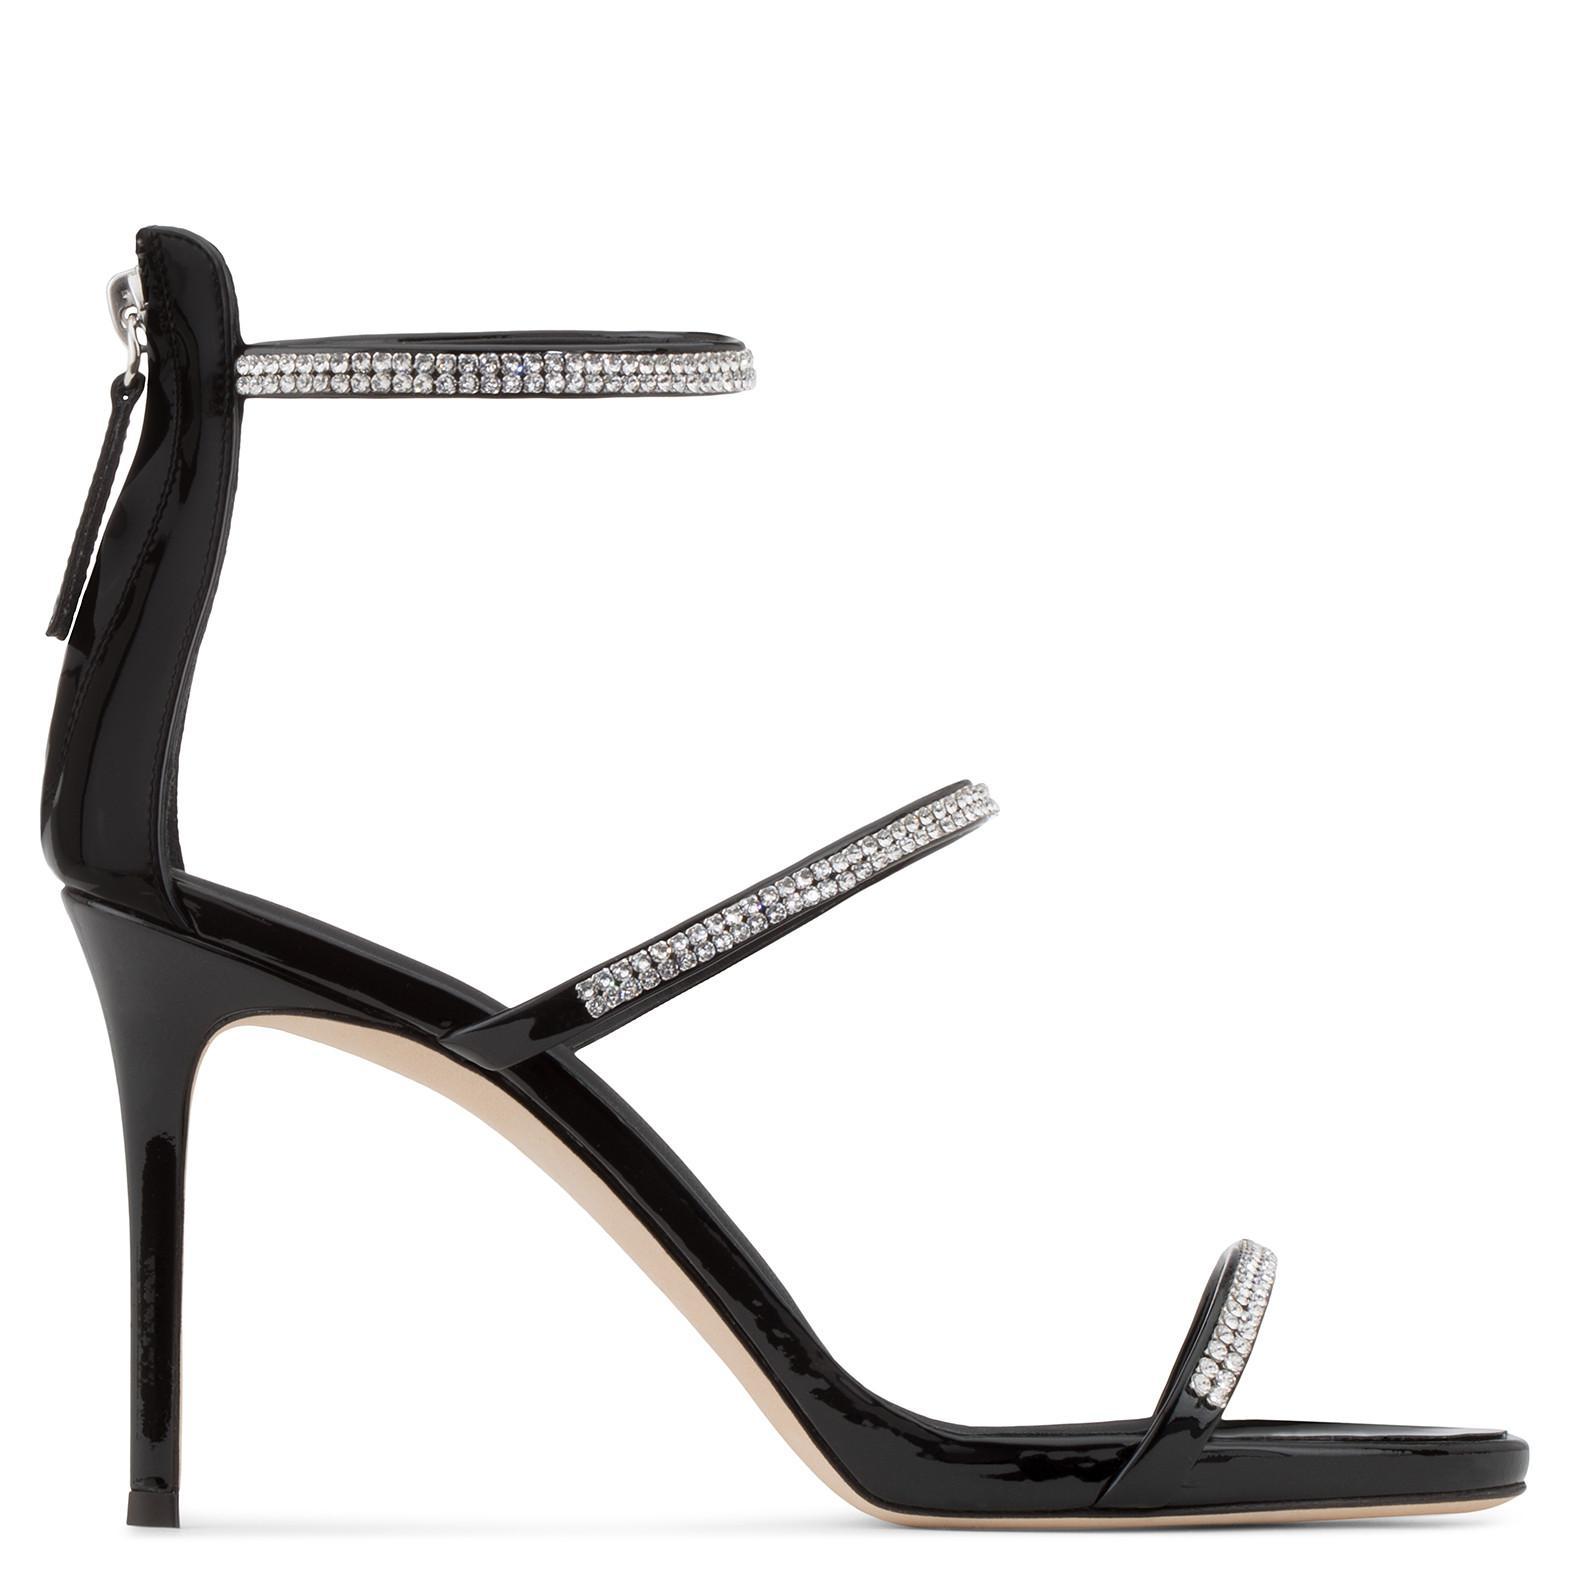 Harmony 90 sandals - Black Giuseppe Zanotti cNpGgZ0pu8